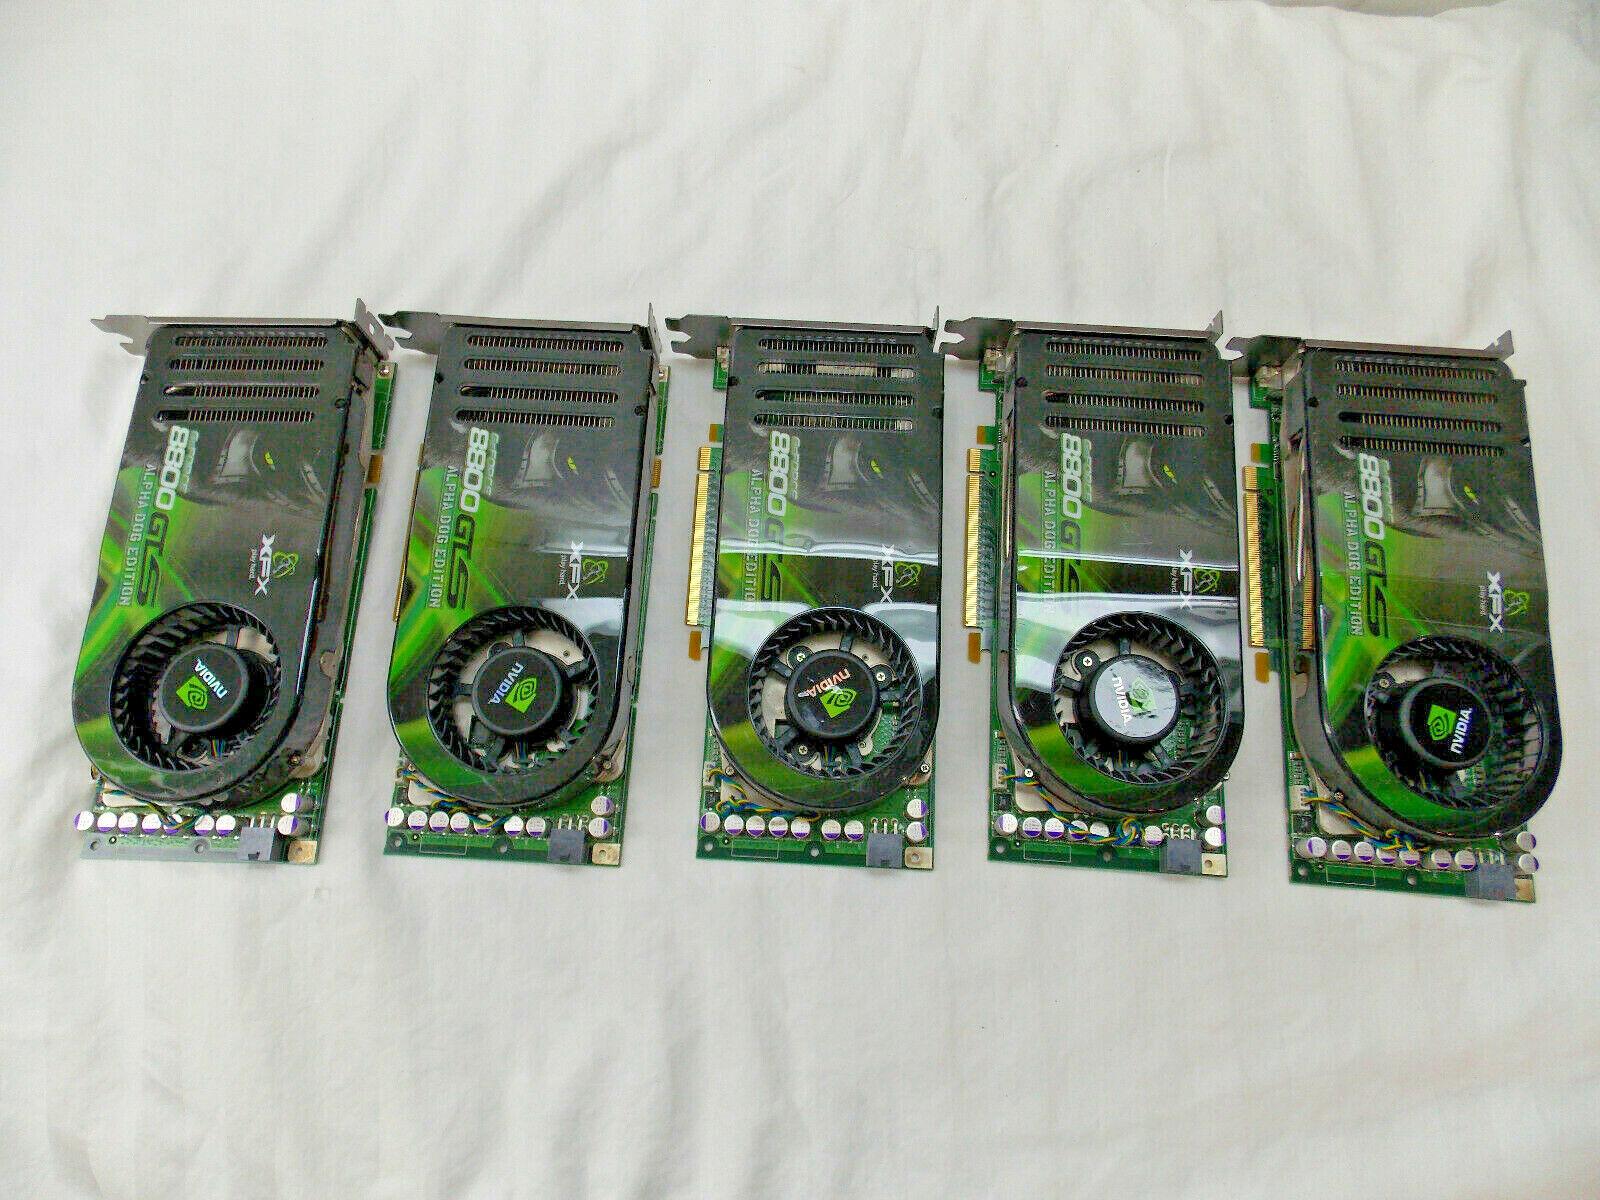 5each GeForce 8800GTS 520M DDR3 Dual DVI TV PCI-E Alpha Dog Edition Graphic Card